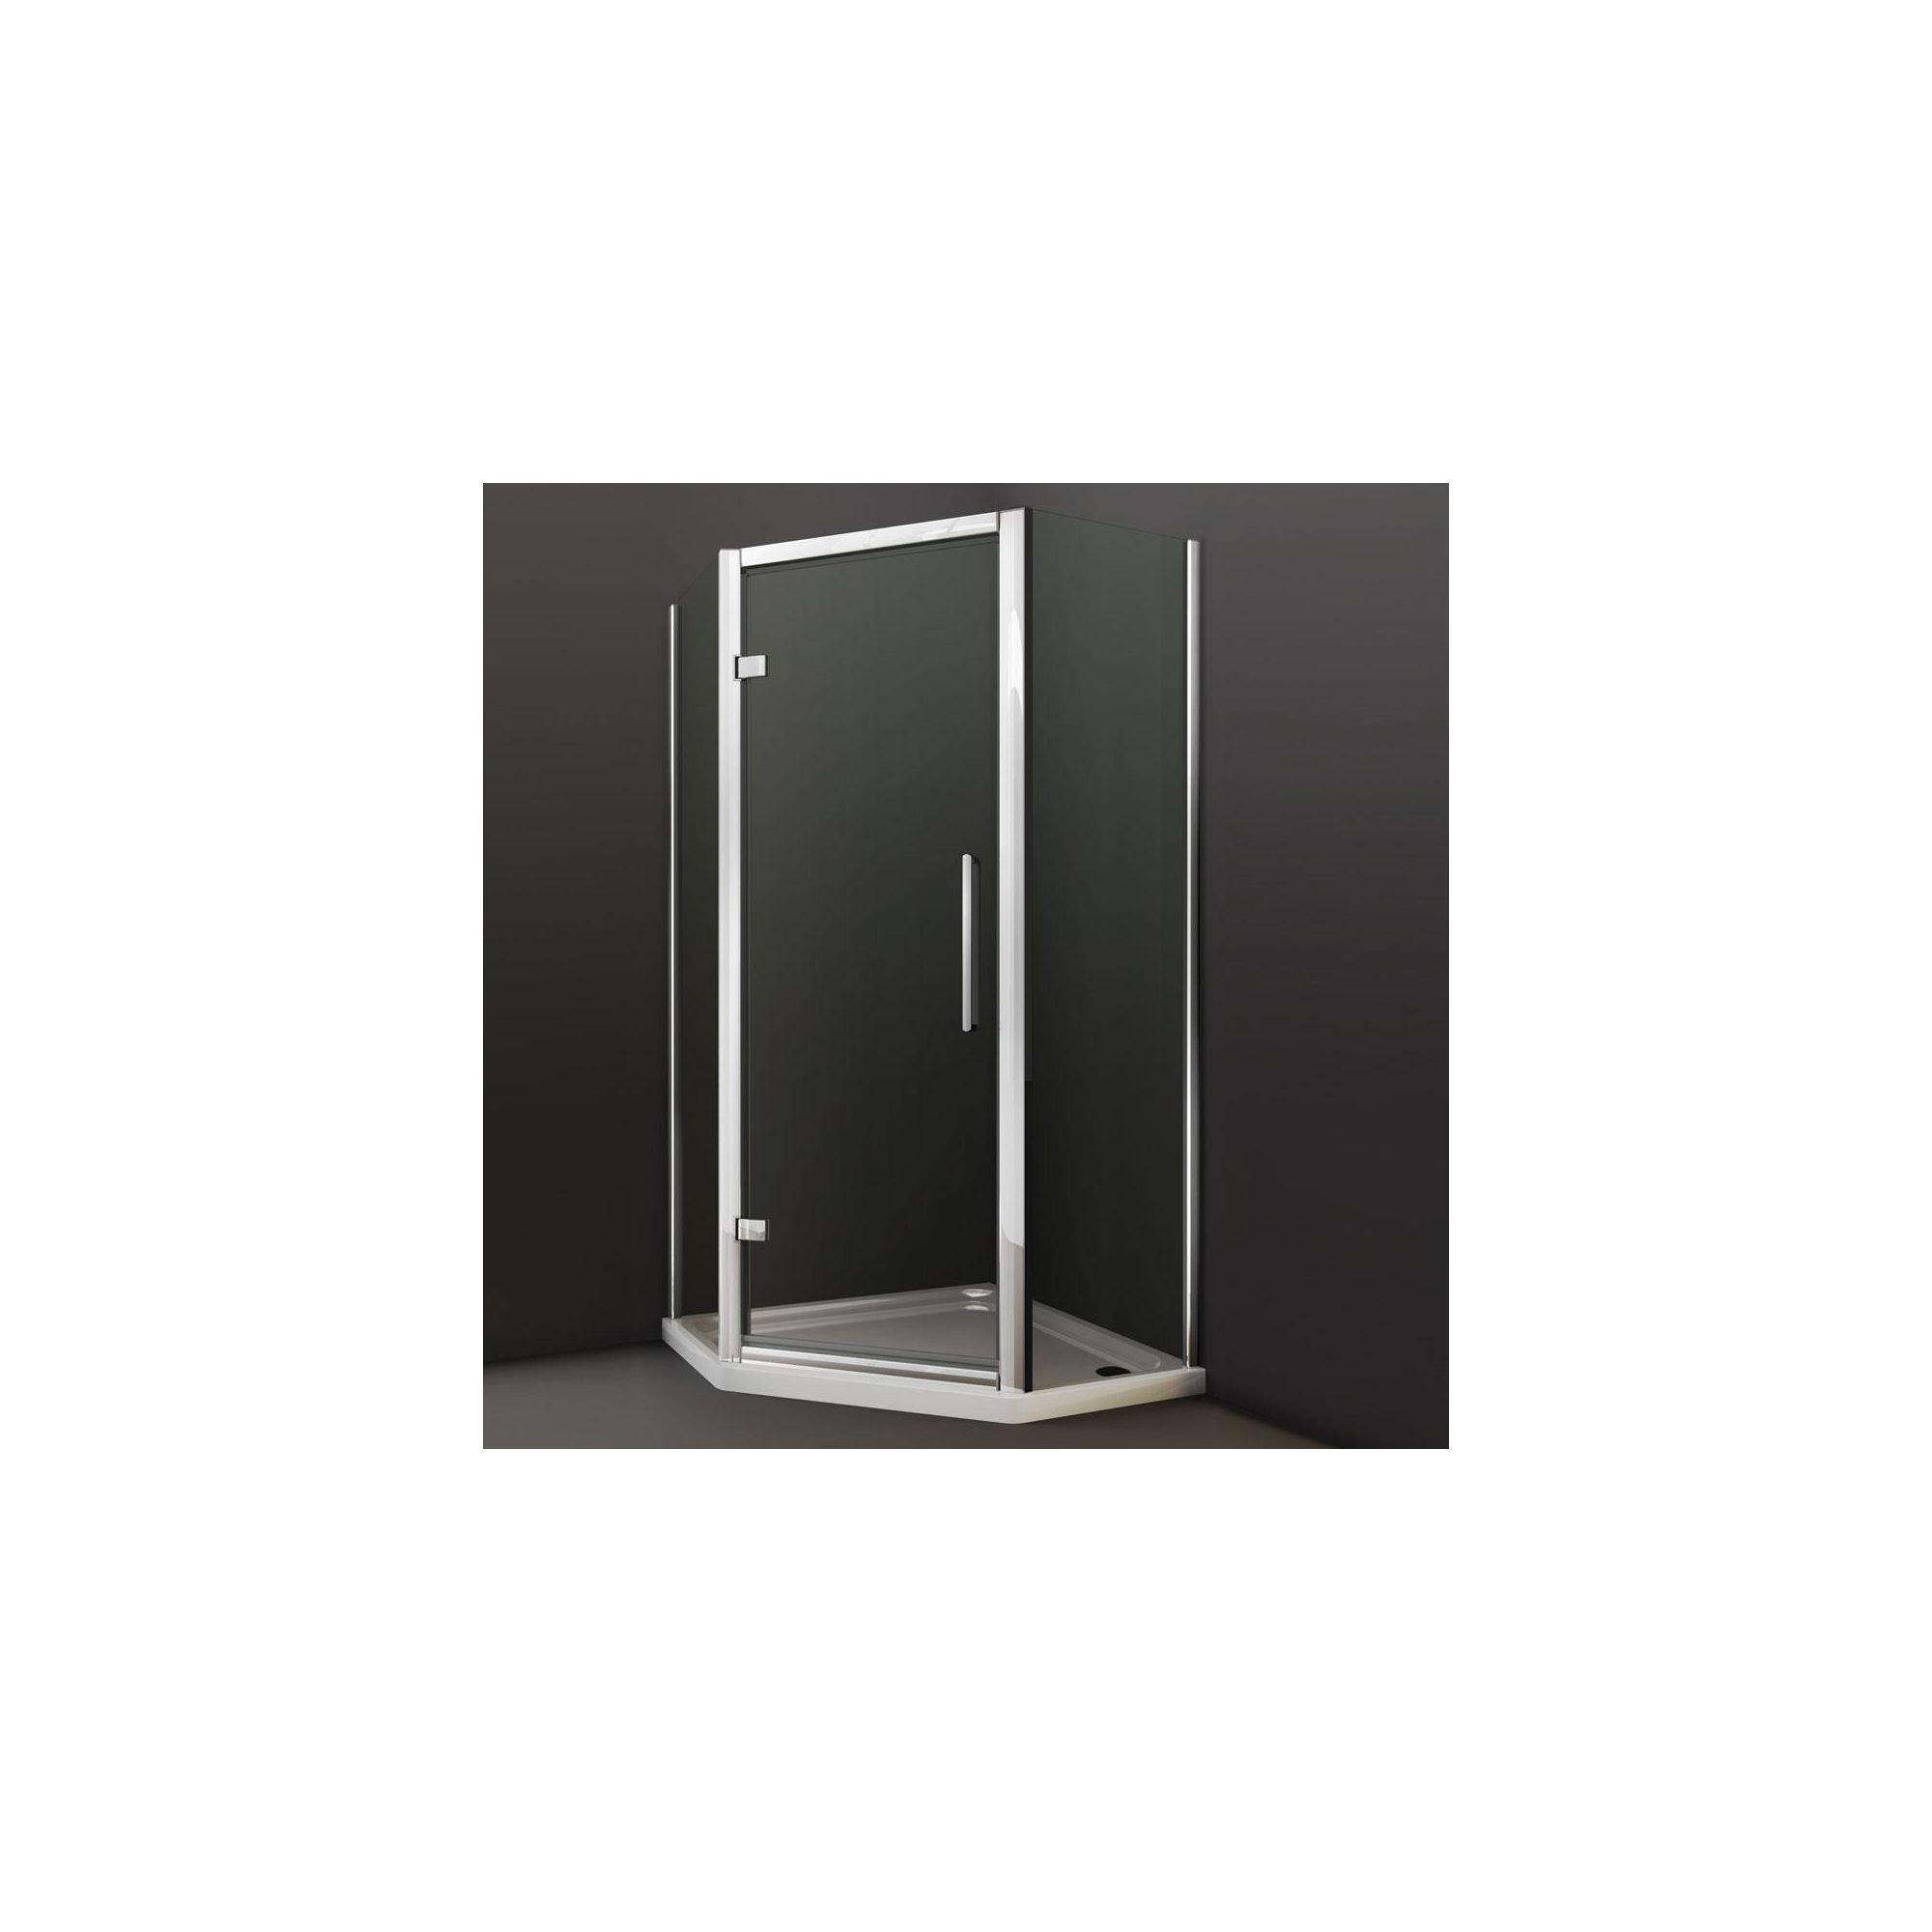 Merlyn Series 8 Pentangle Shower Door, 900mm x 900mm, Chrome Frame, 8mm Glass at Tesco Direct